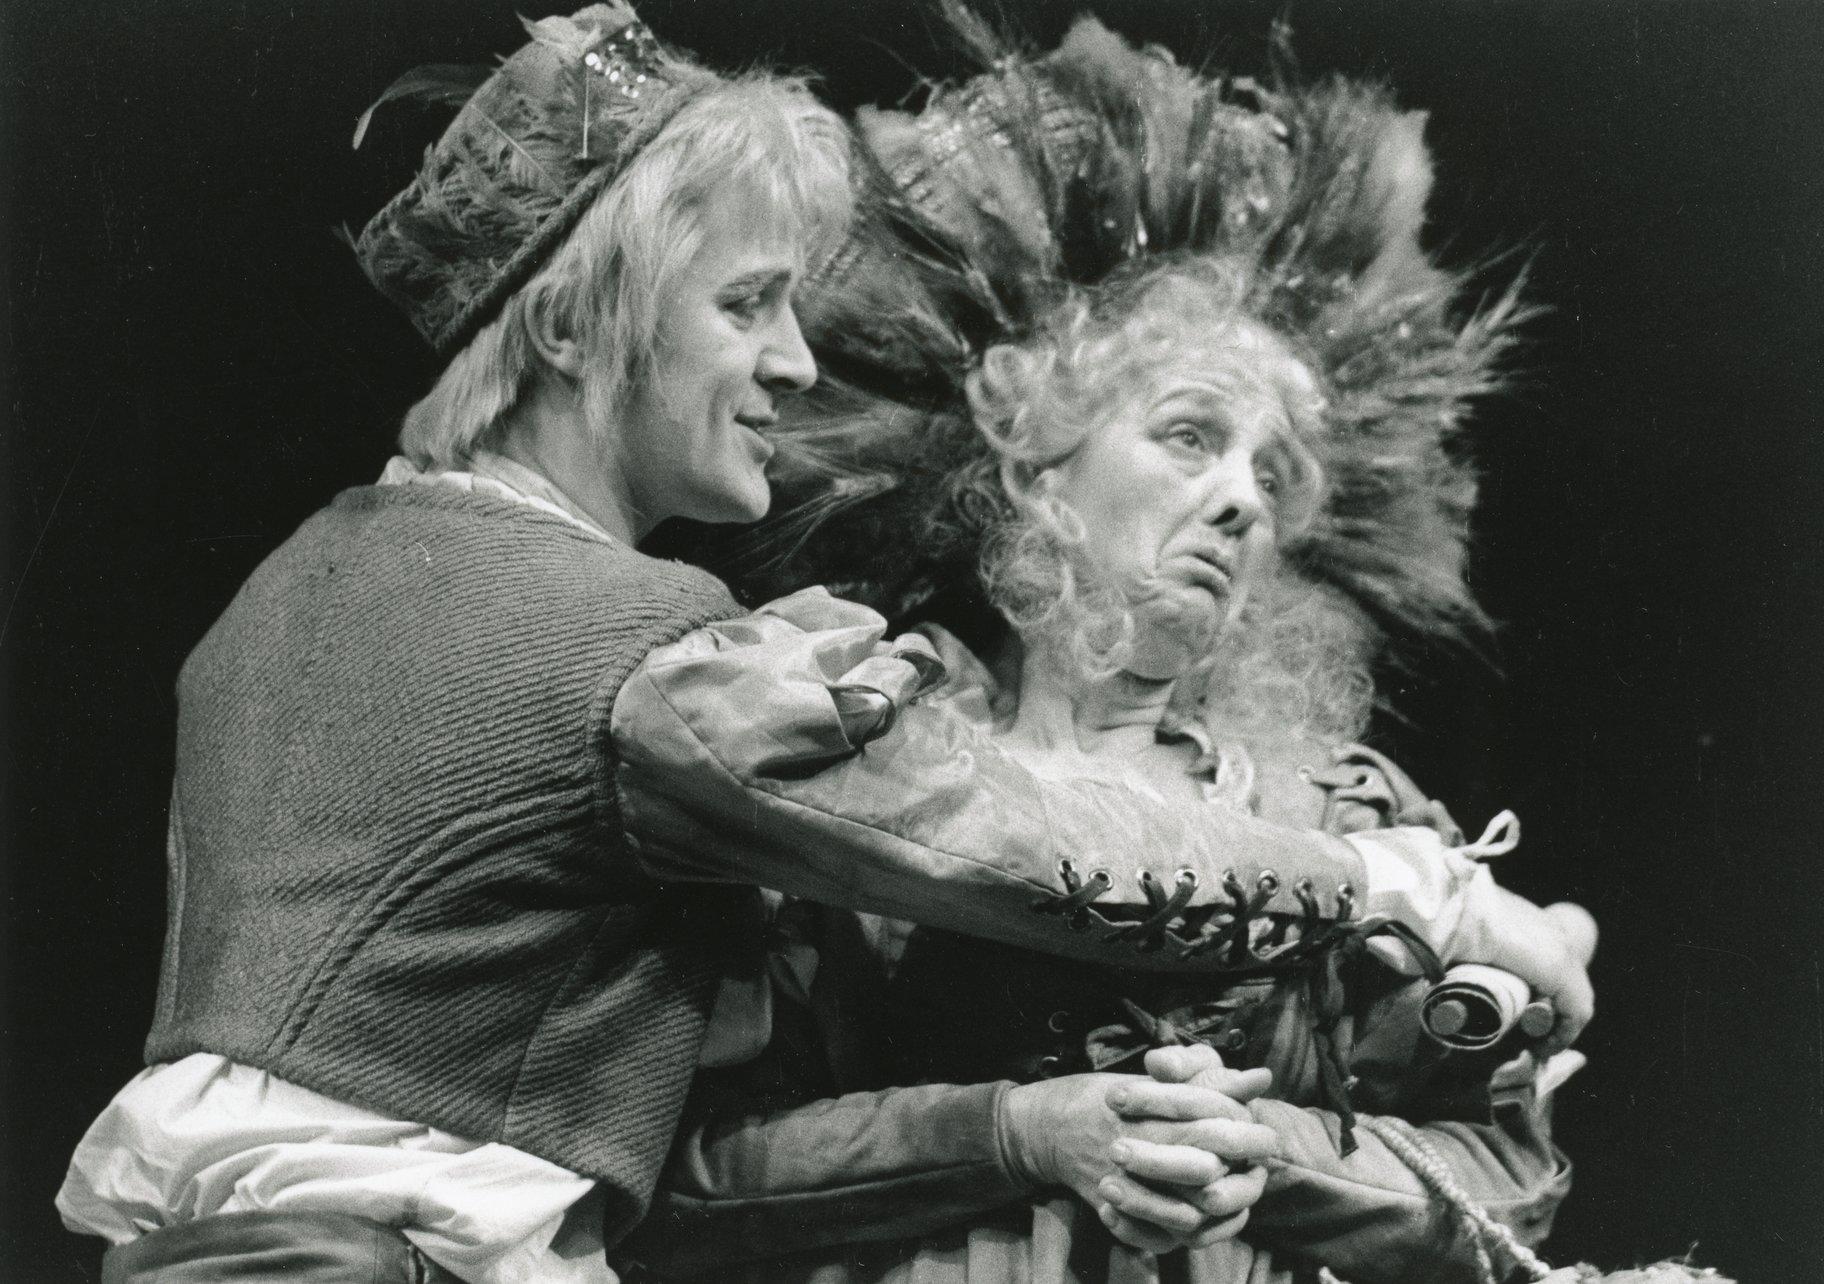 A man hugs a sad woman in a large feathered headdress.